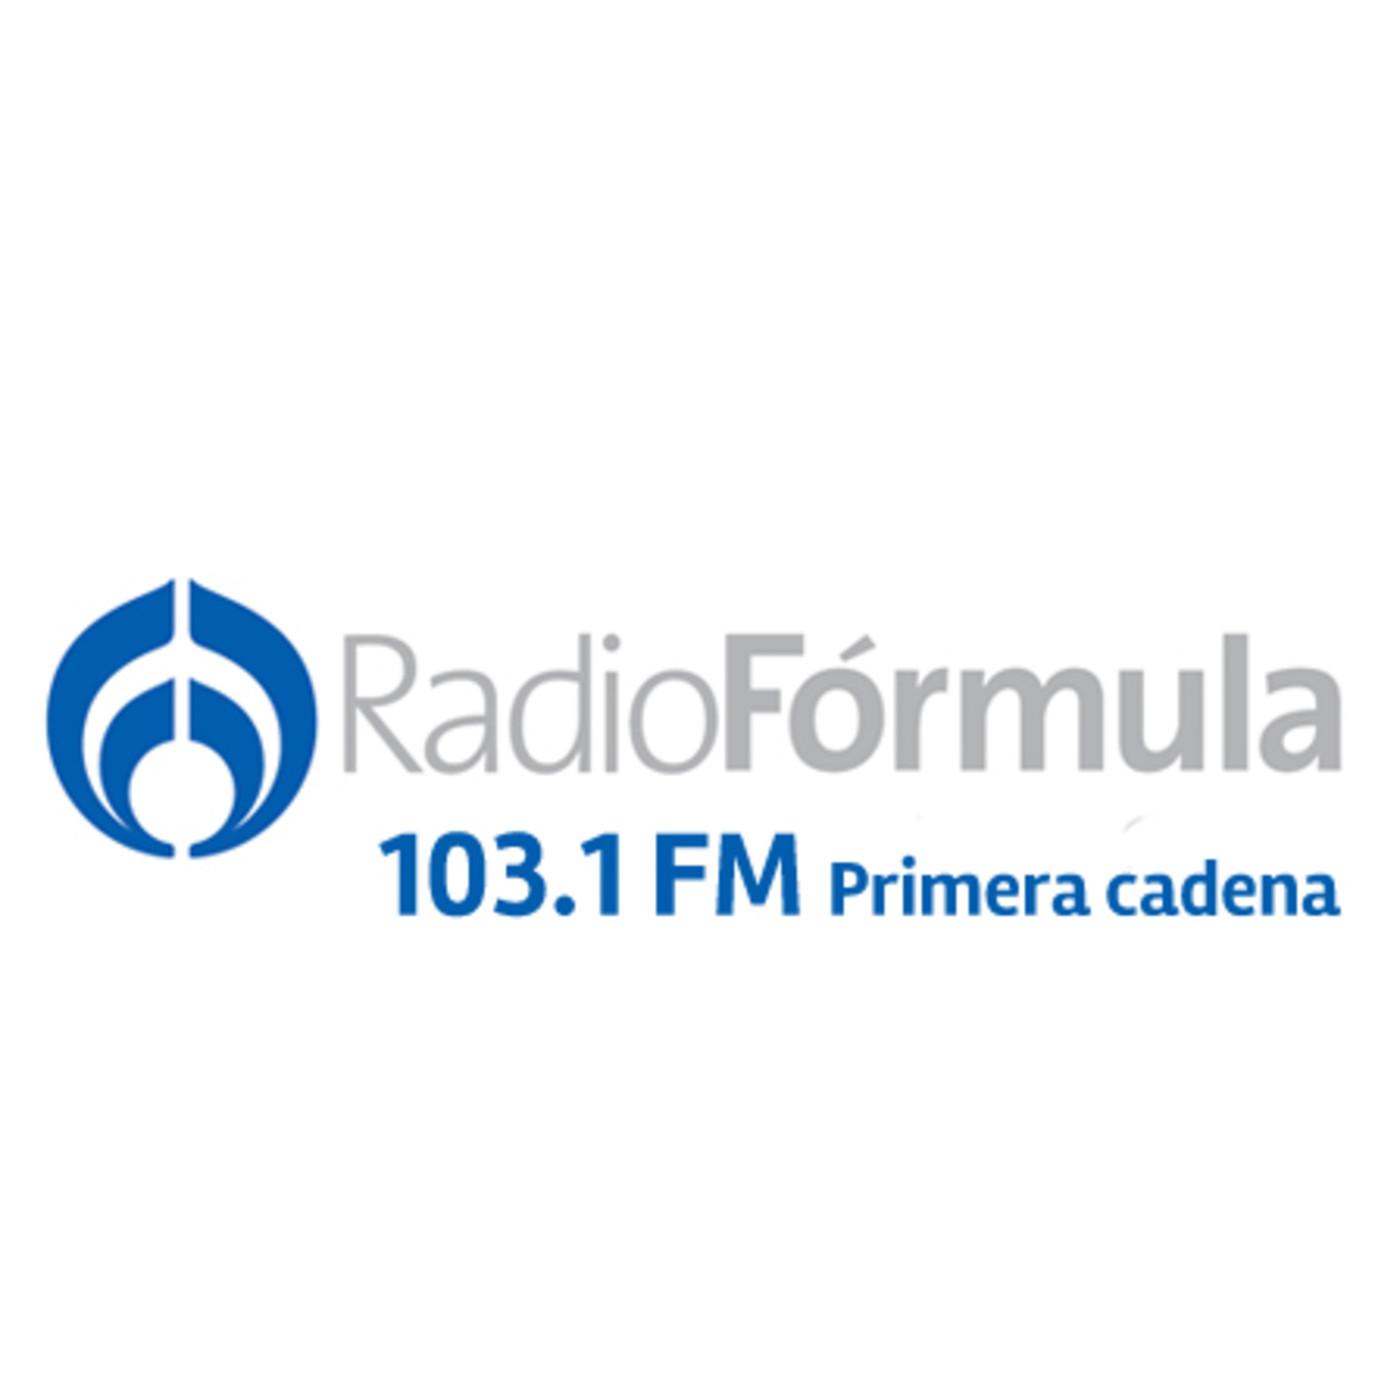 Radio Fórmula 103.1 FM - Primera Cadena